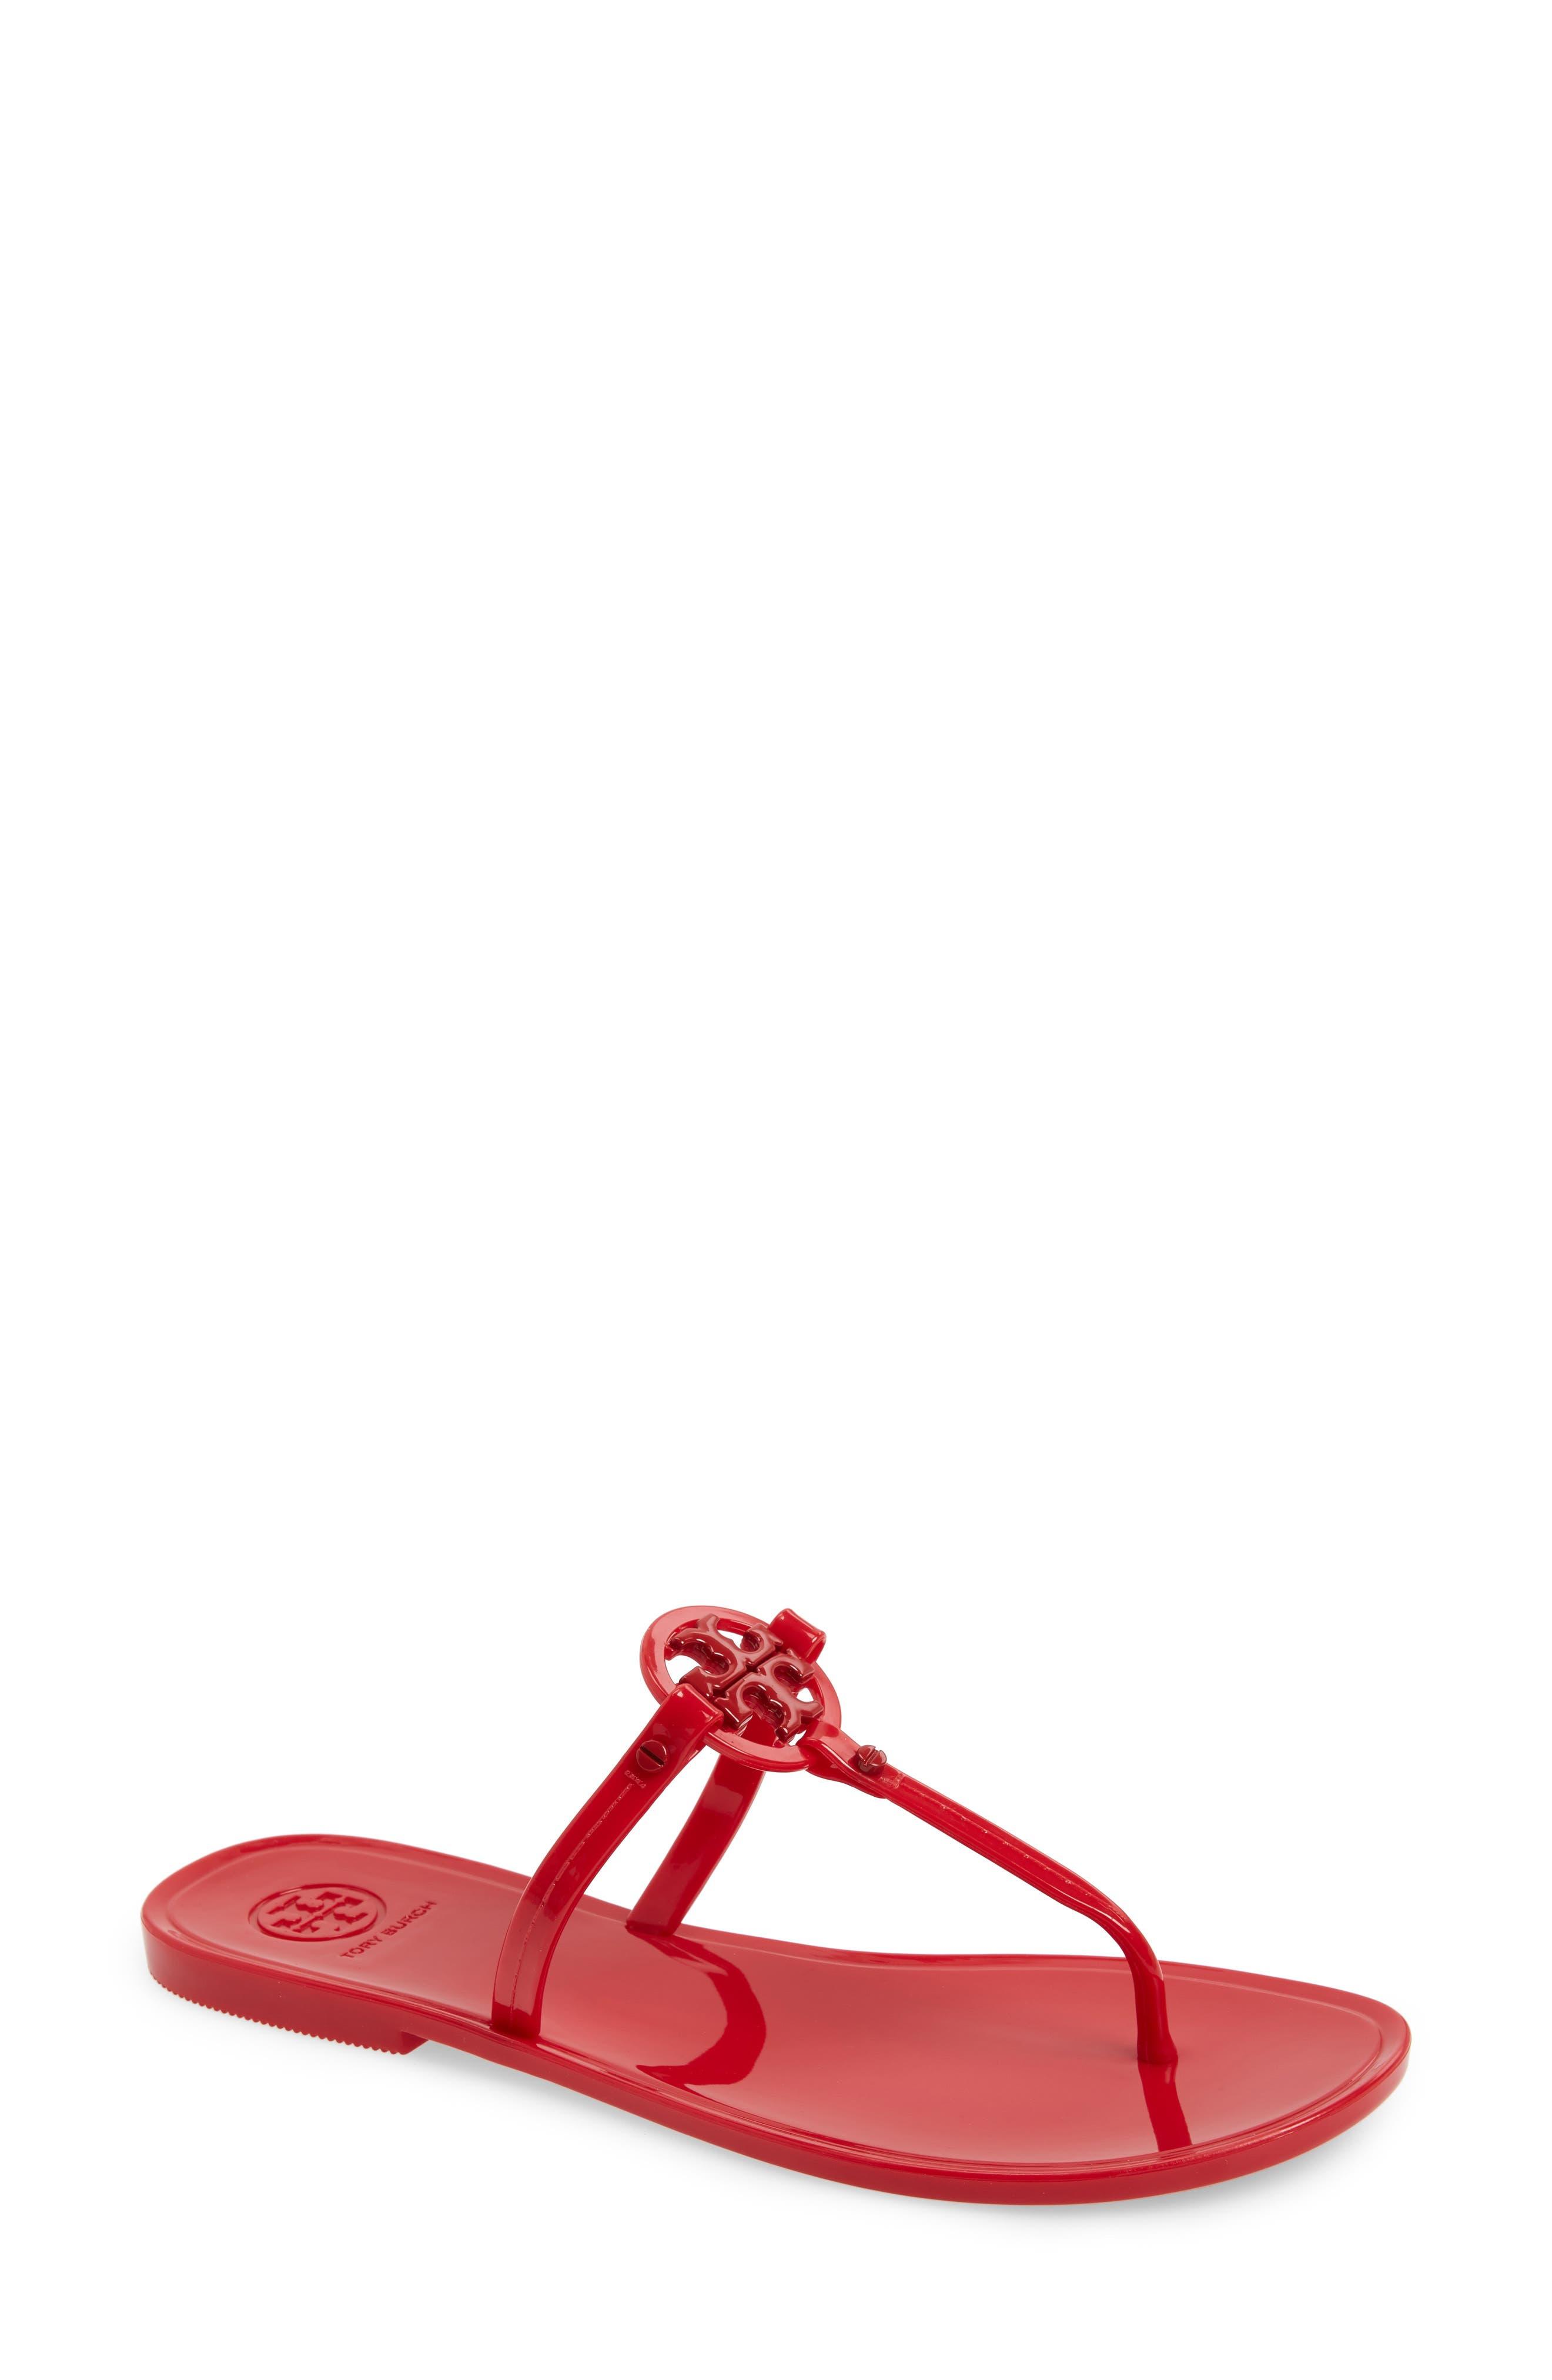 9315eb7be8da1 tory burch miller sandal